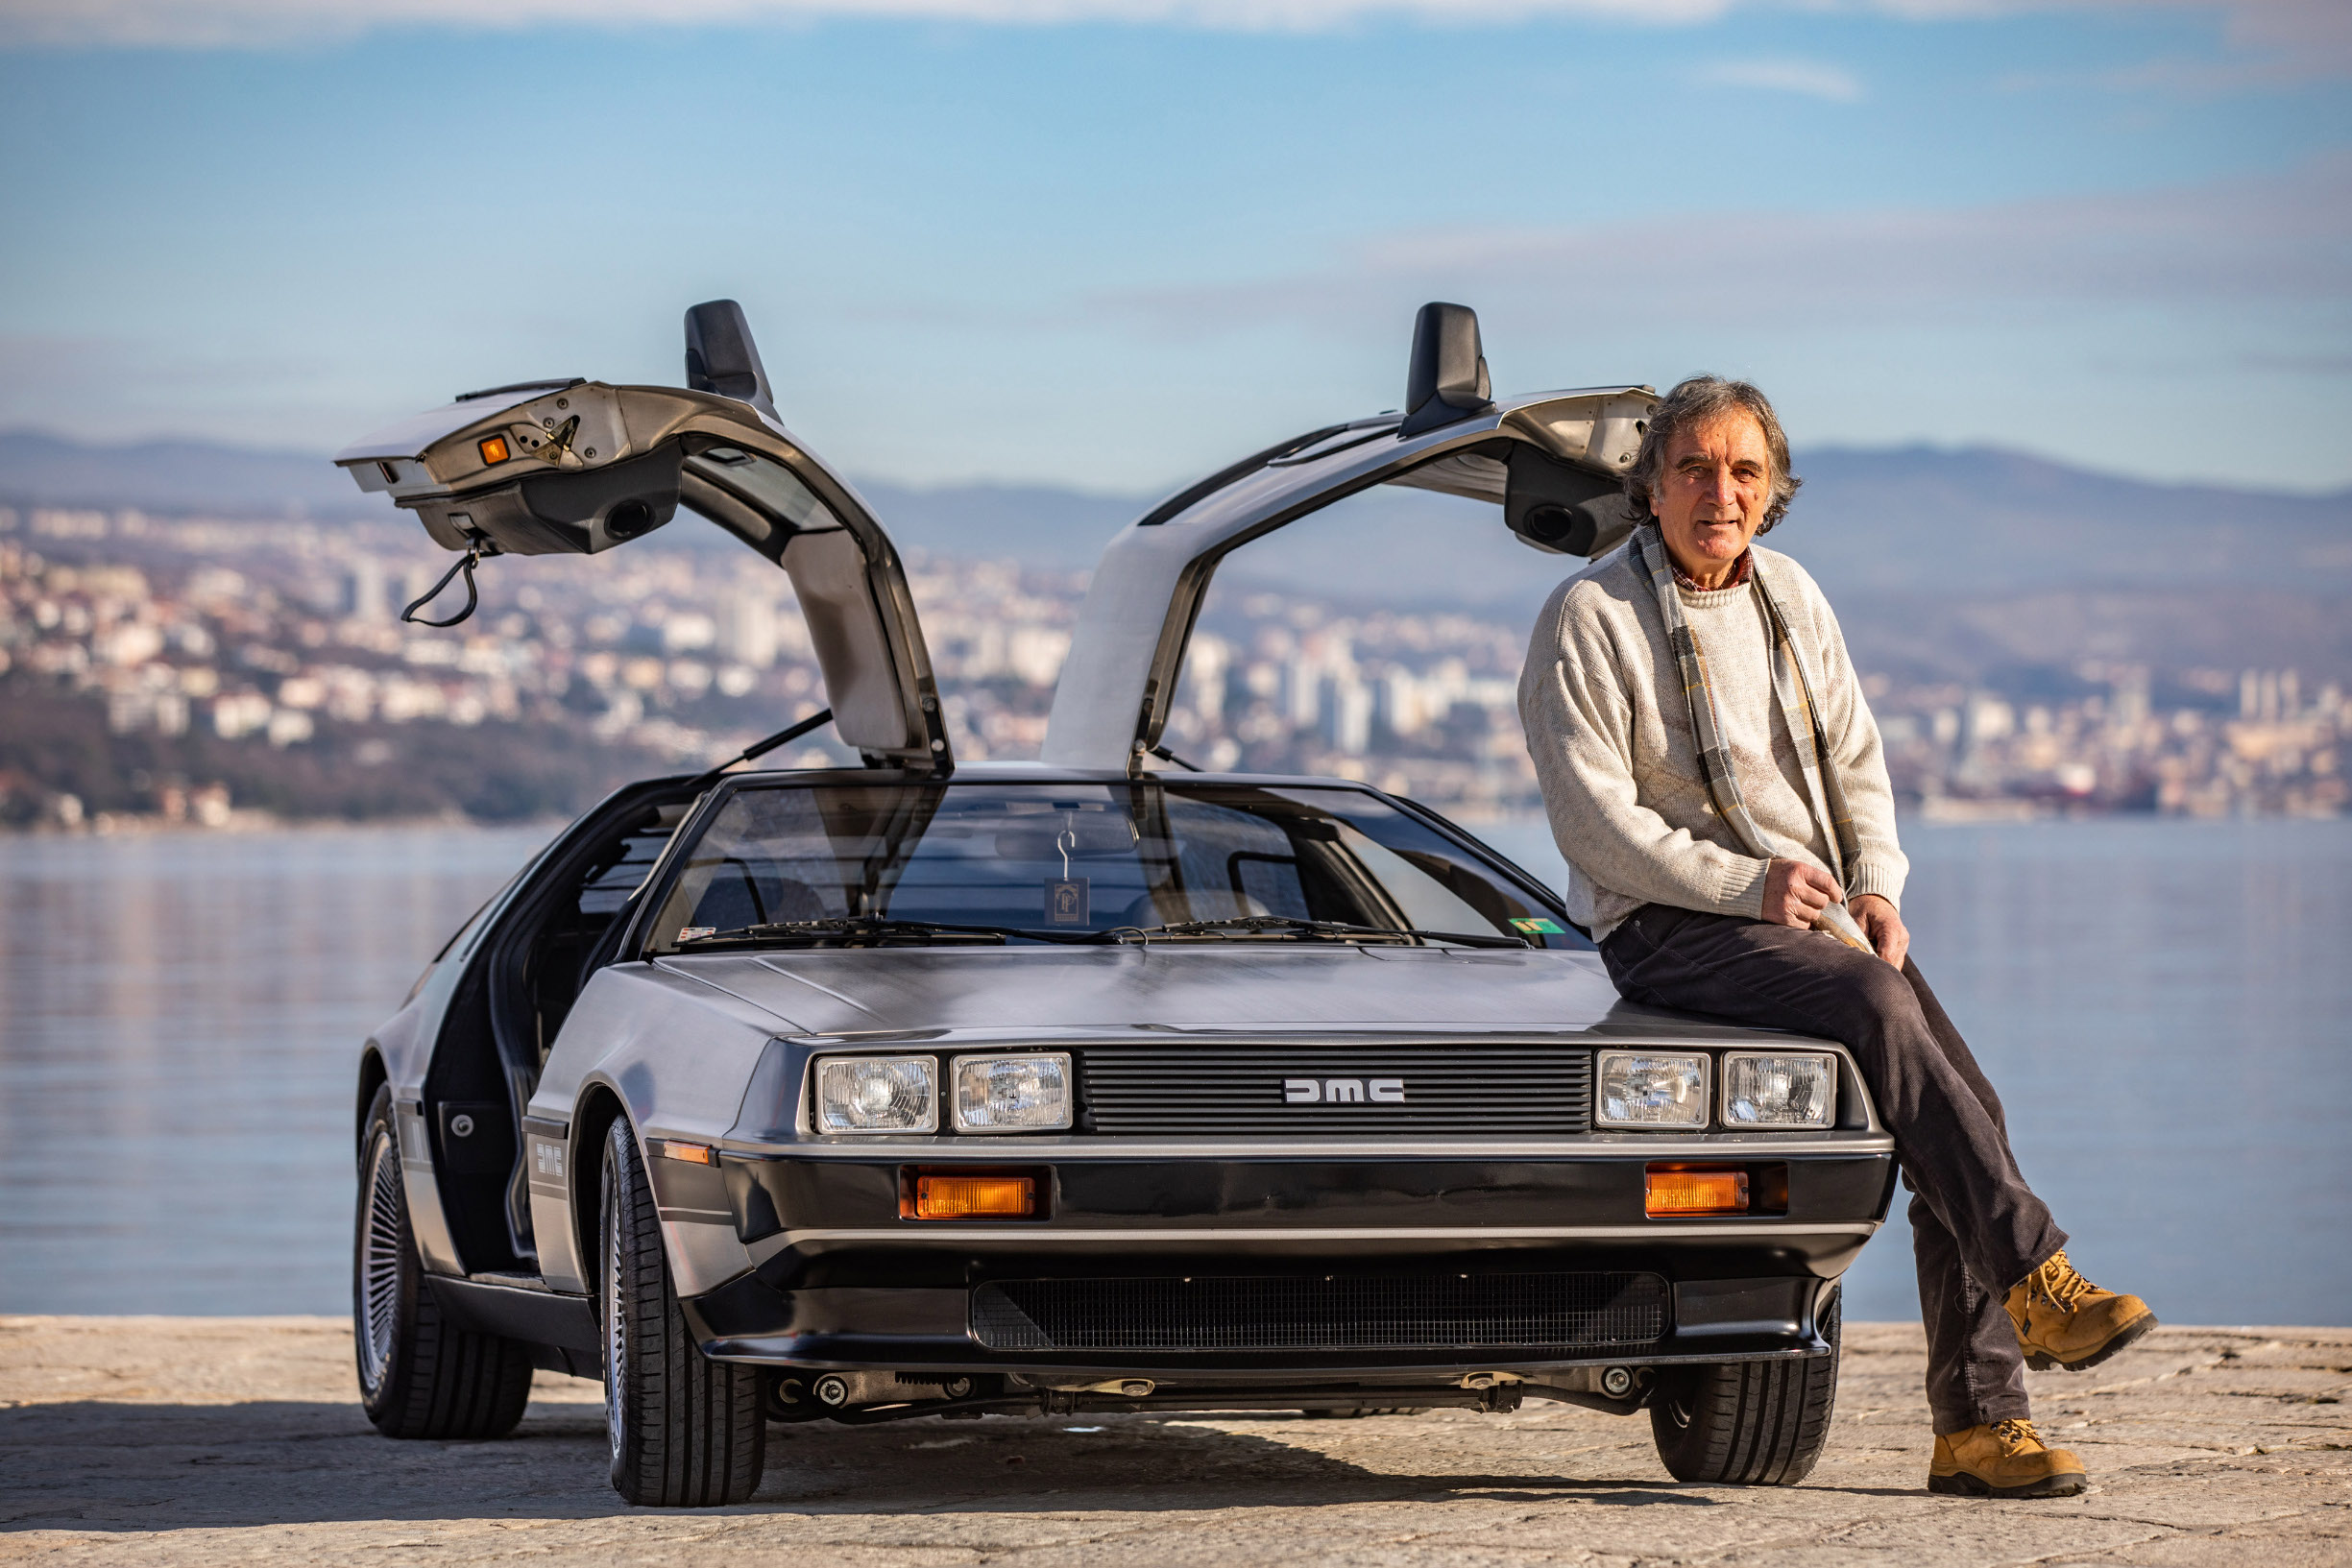 Rijeka, 070120 Reportaza o jedinom primjerku auta DeLorean u Hrvatskoj. Na fotografiji: Leo Spanjol, vlasnik vozila. Foto: Matija Djanjesic / CROPIX